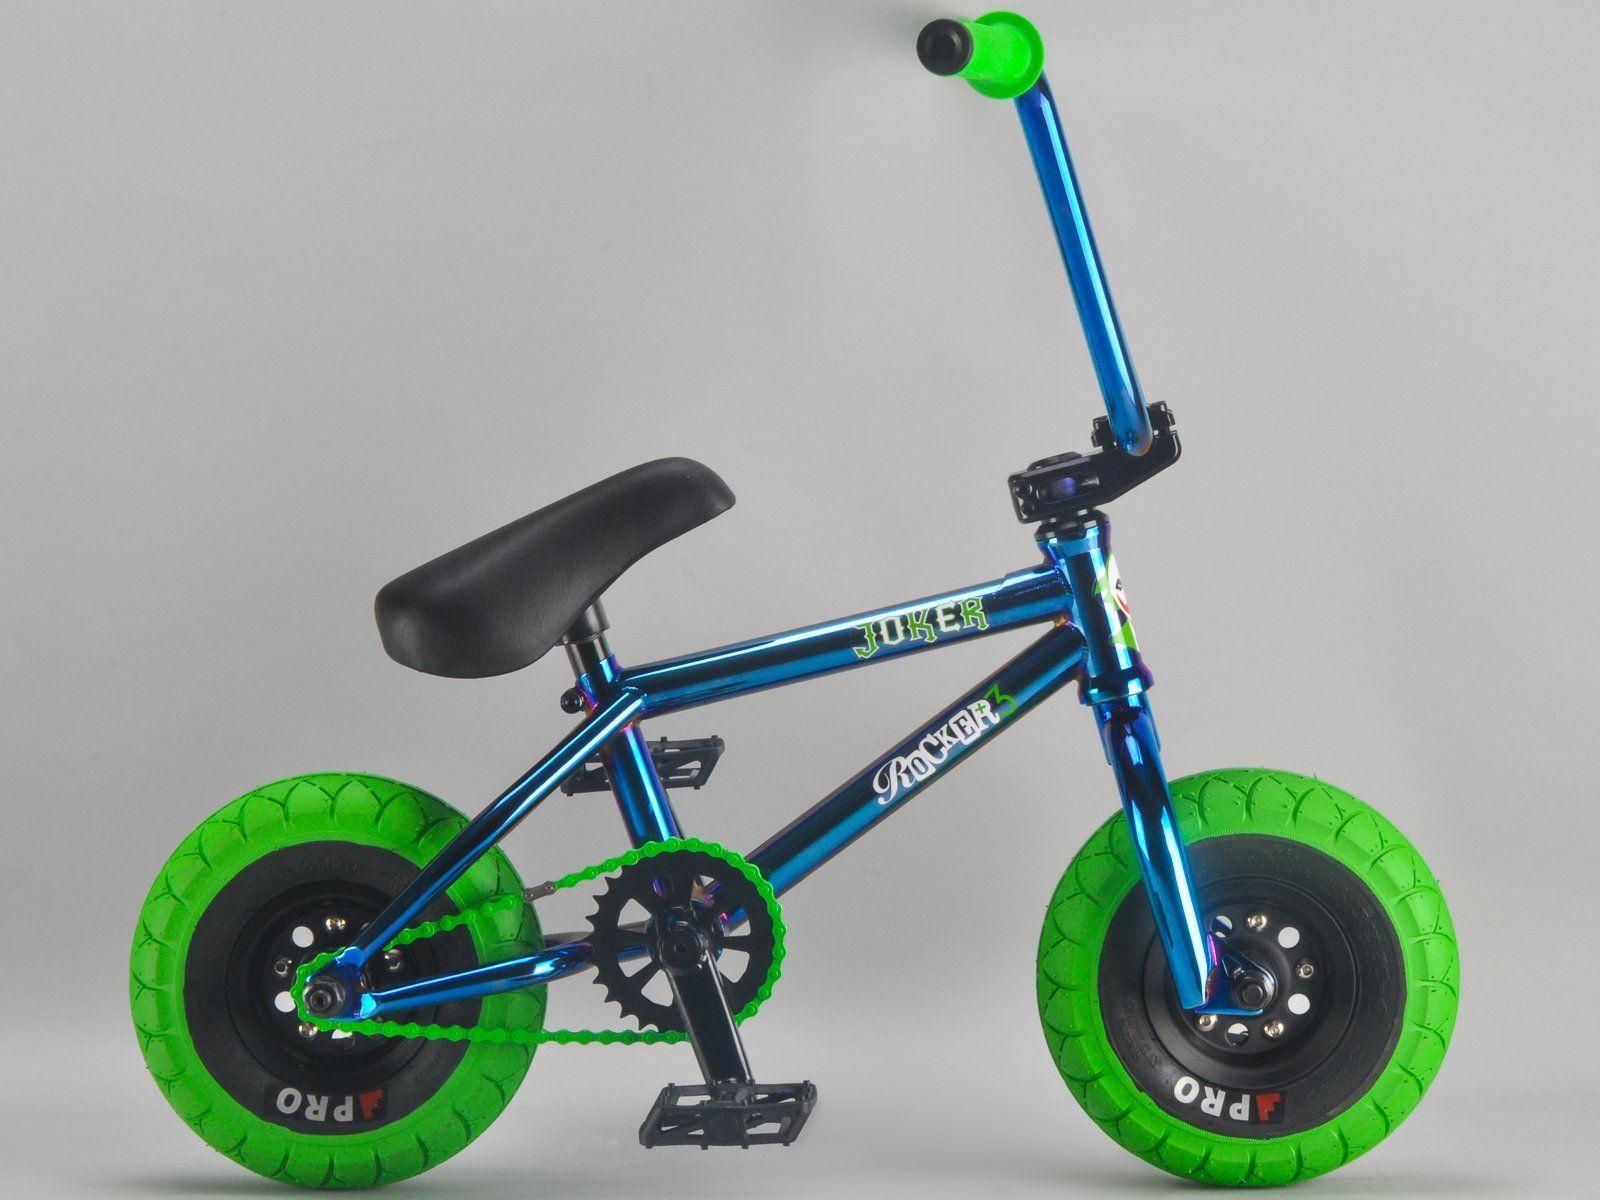 Rocker 3 joker bmx mini bmx bike read more at the image link this is an affiliate link bmxbikescollection